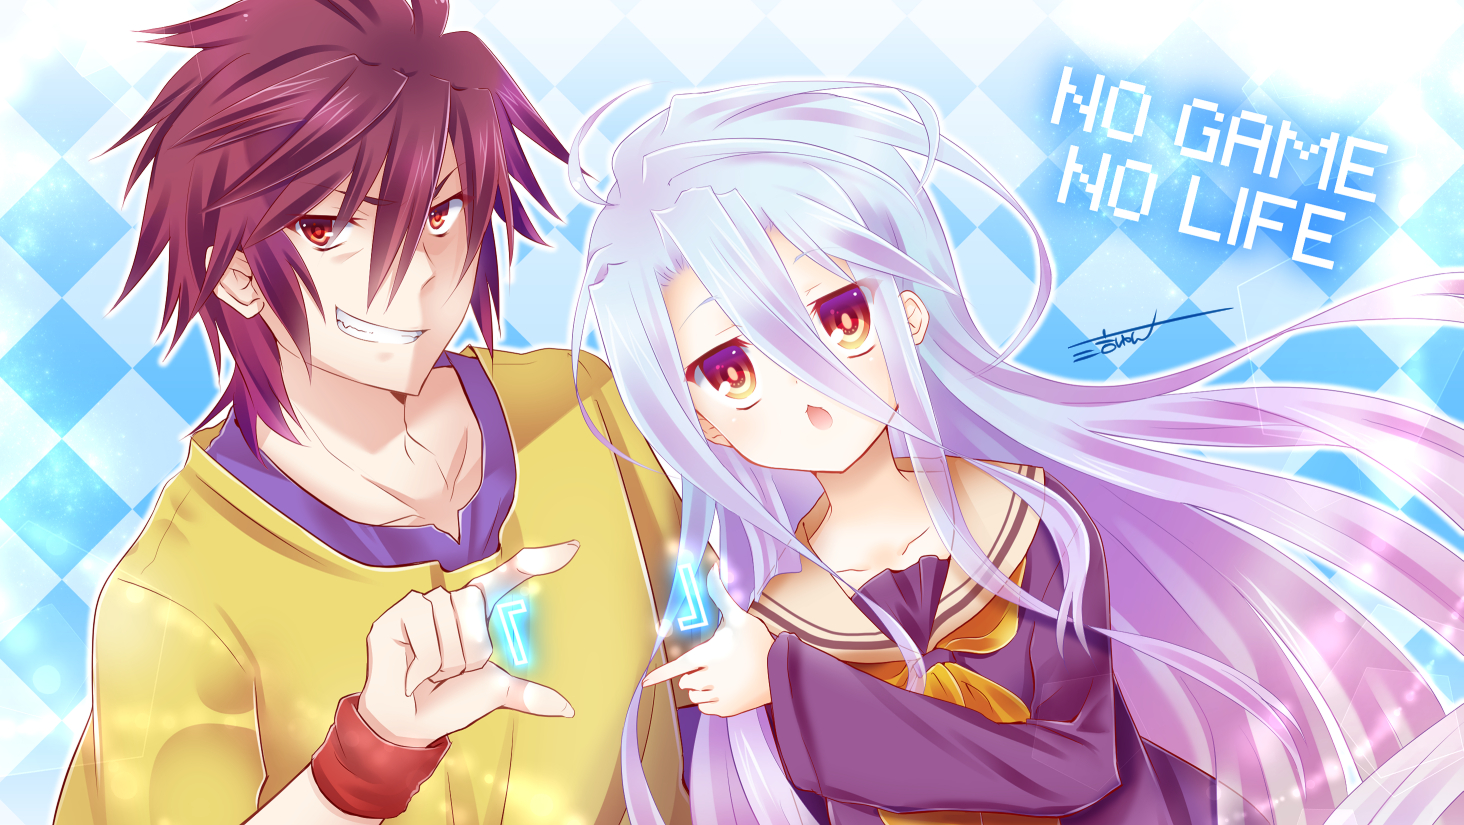 Hasil gambar untuk no game no life sora and shiro